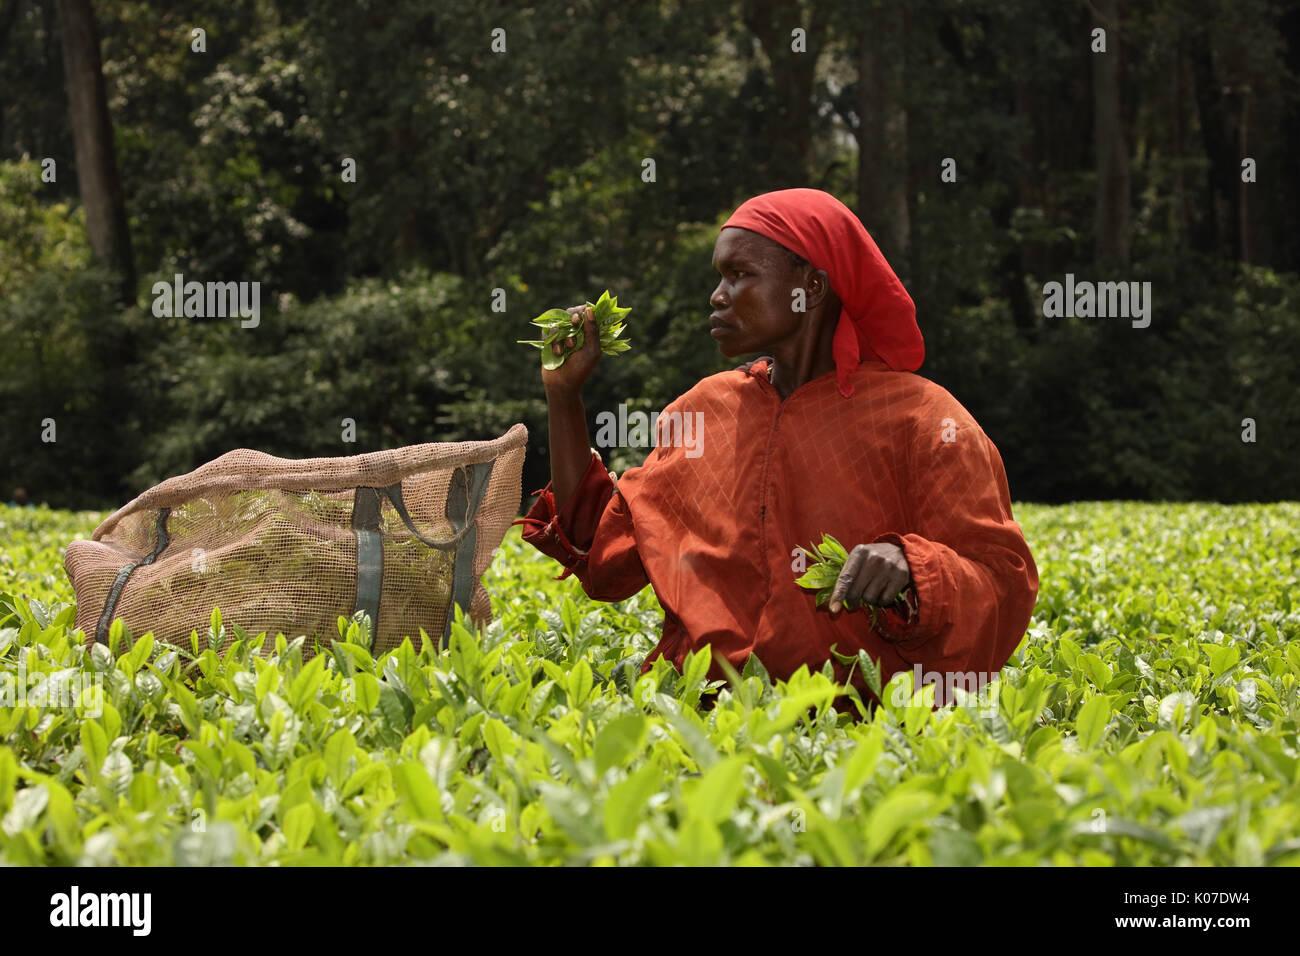 Tea picking, Kakamega forest, Kenya, tea used as buffer from human disturbance on the boundariy of forest Stock Photo